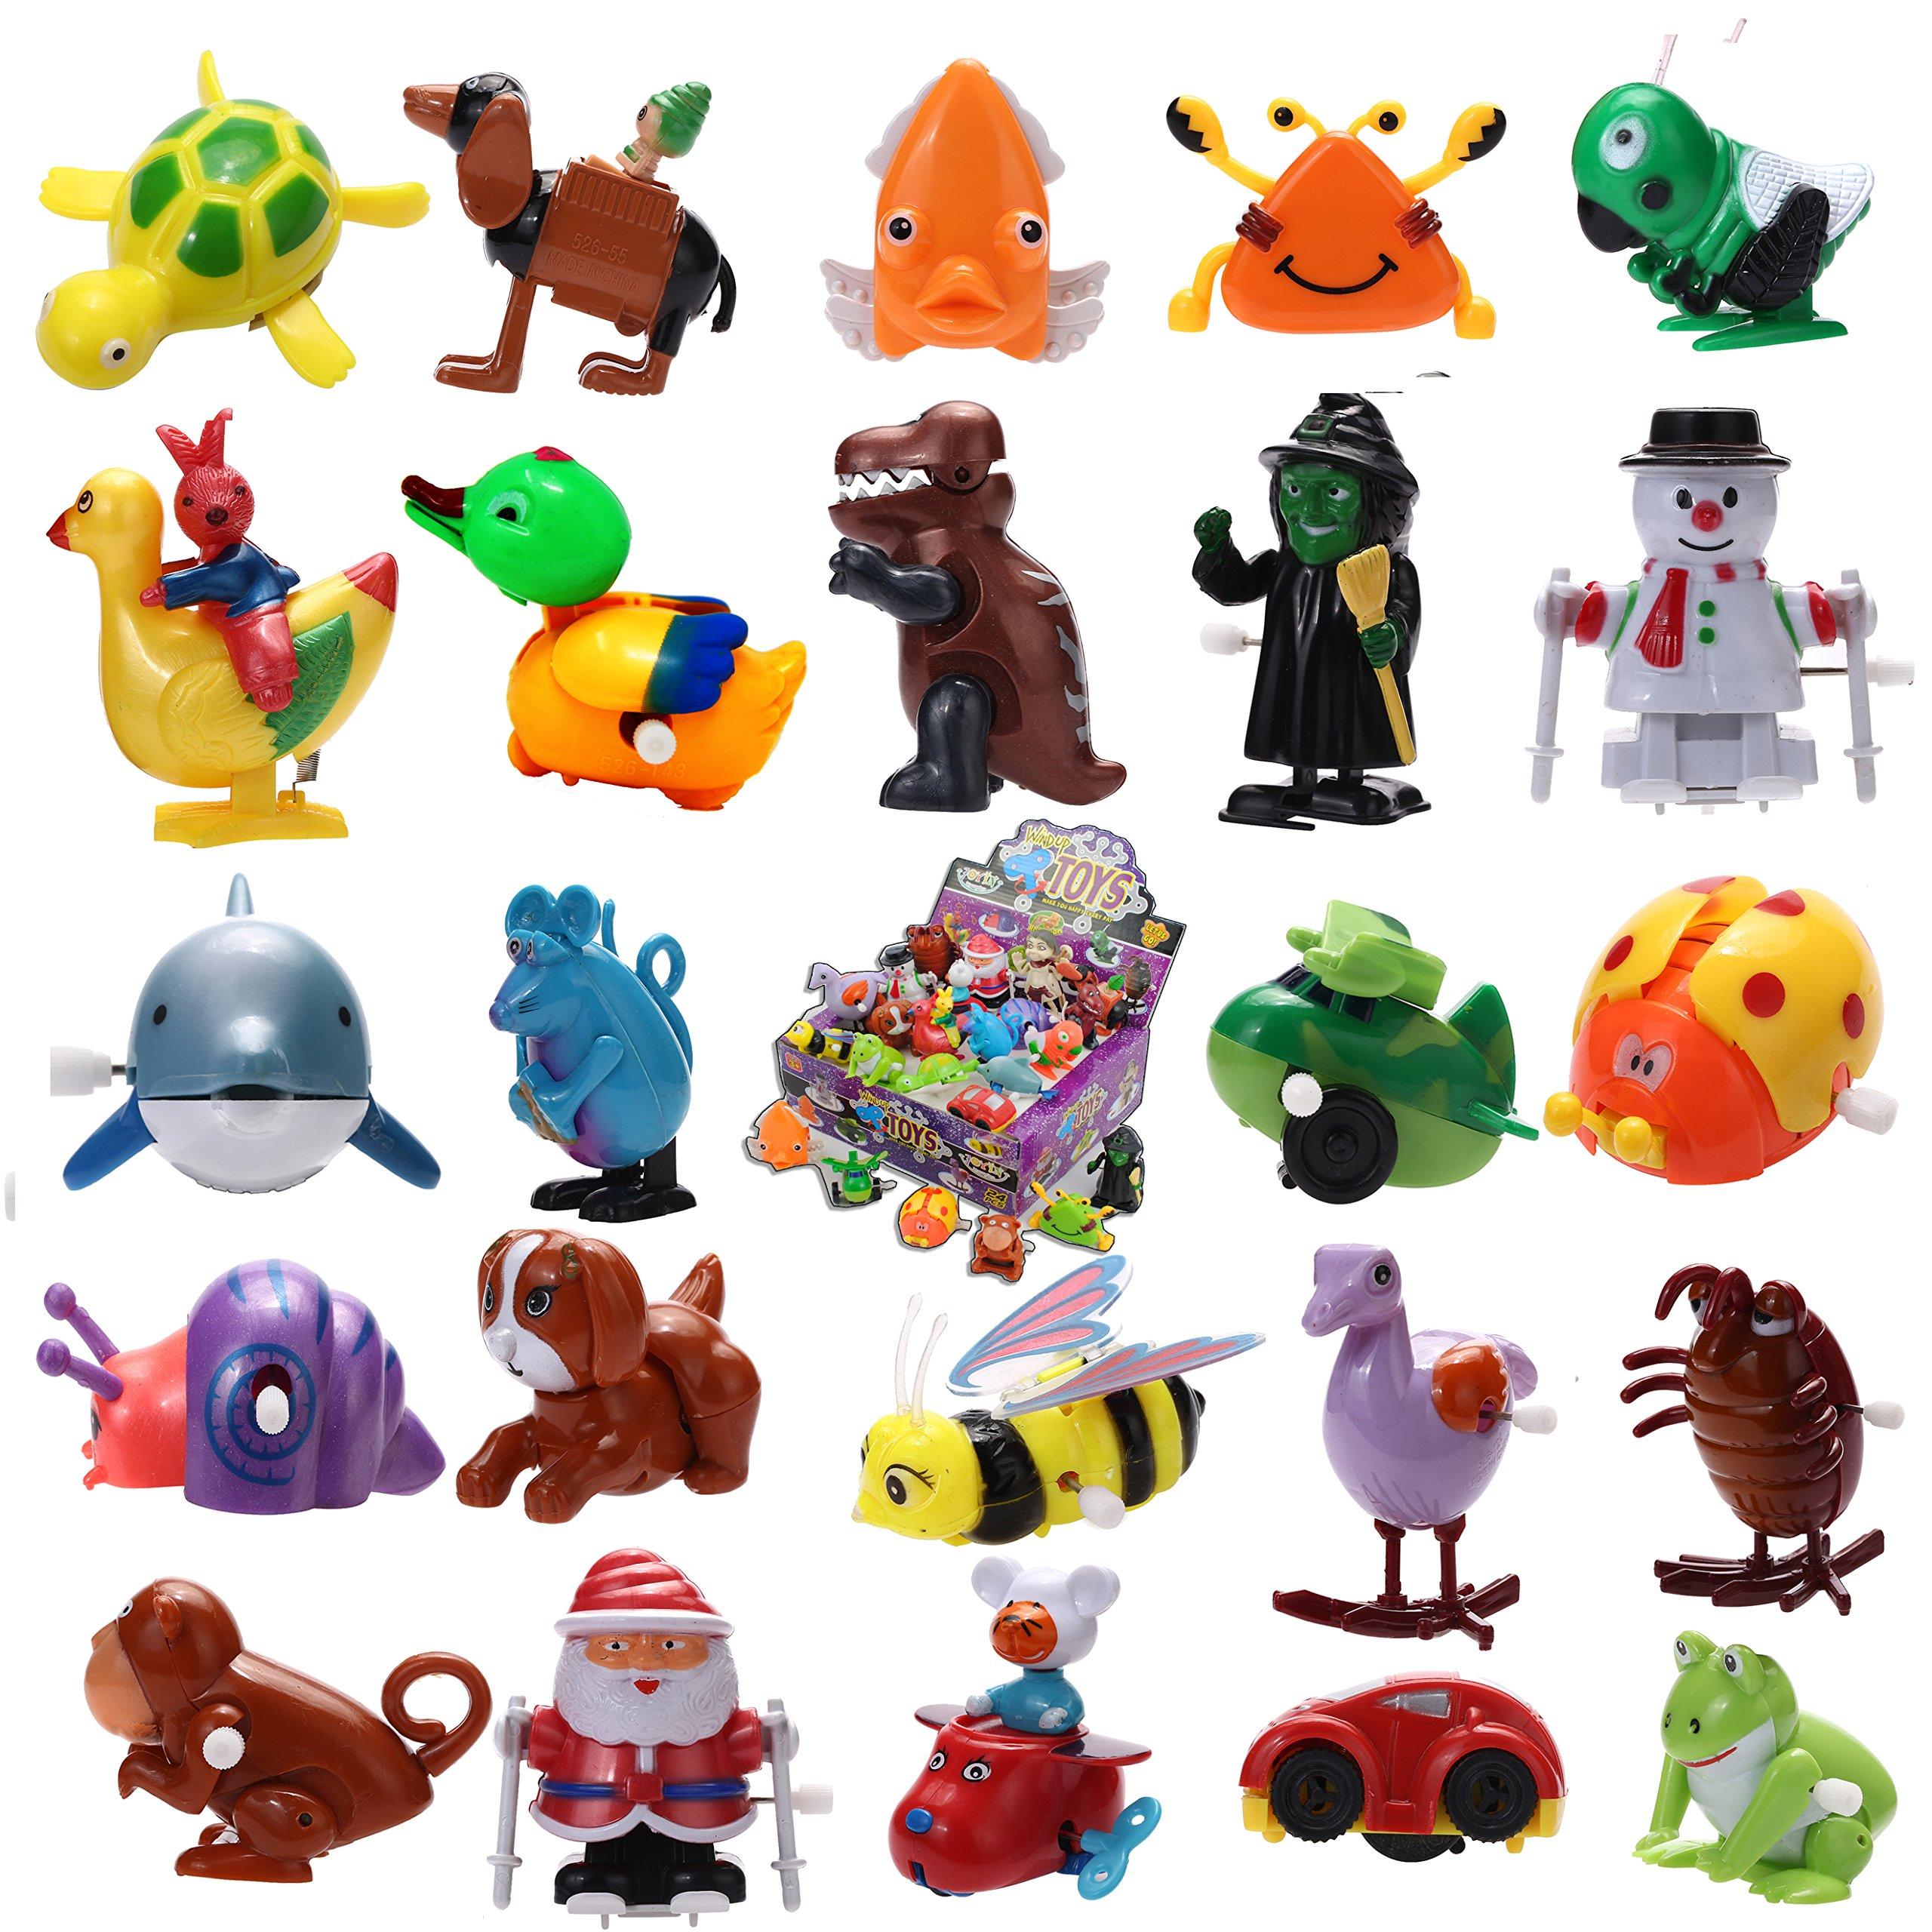 JOYIN 24 Pieces Assorted Wind-up Toys for Kids Party Favors (2 Dozen) by Joyin Toy